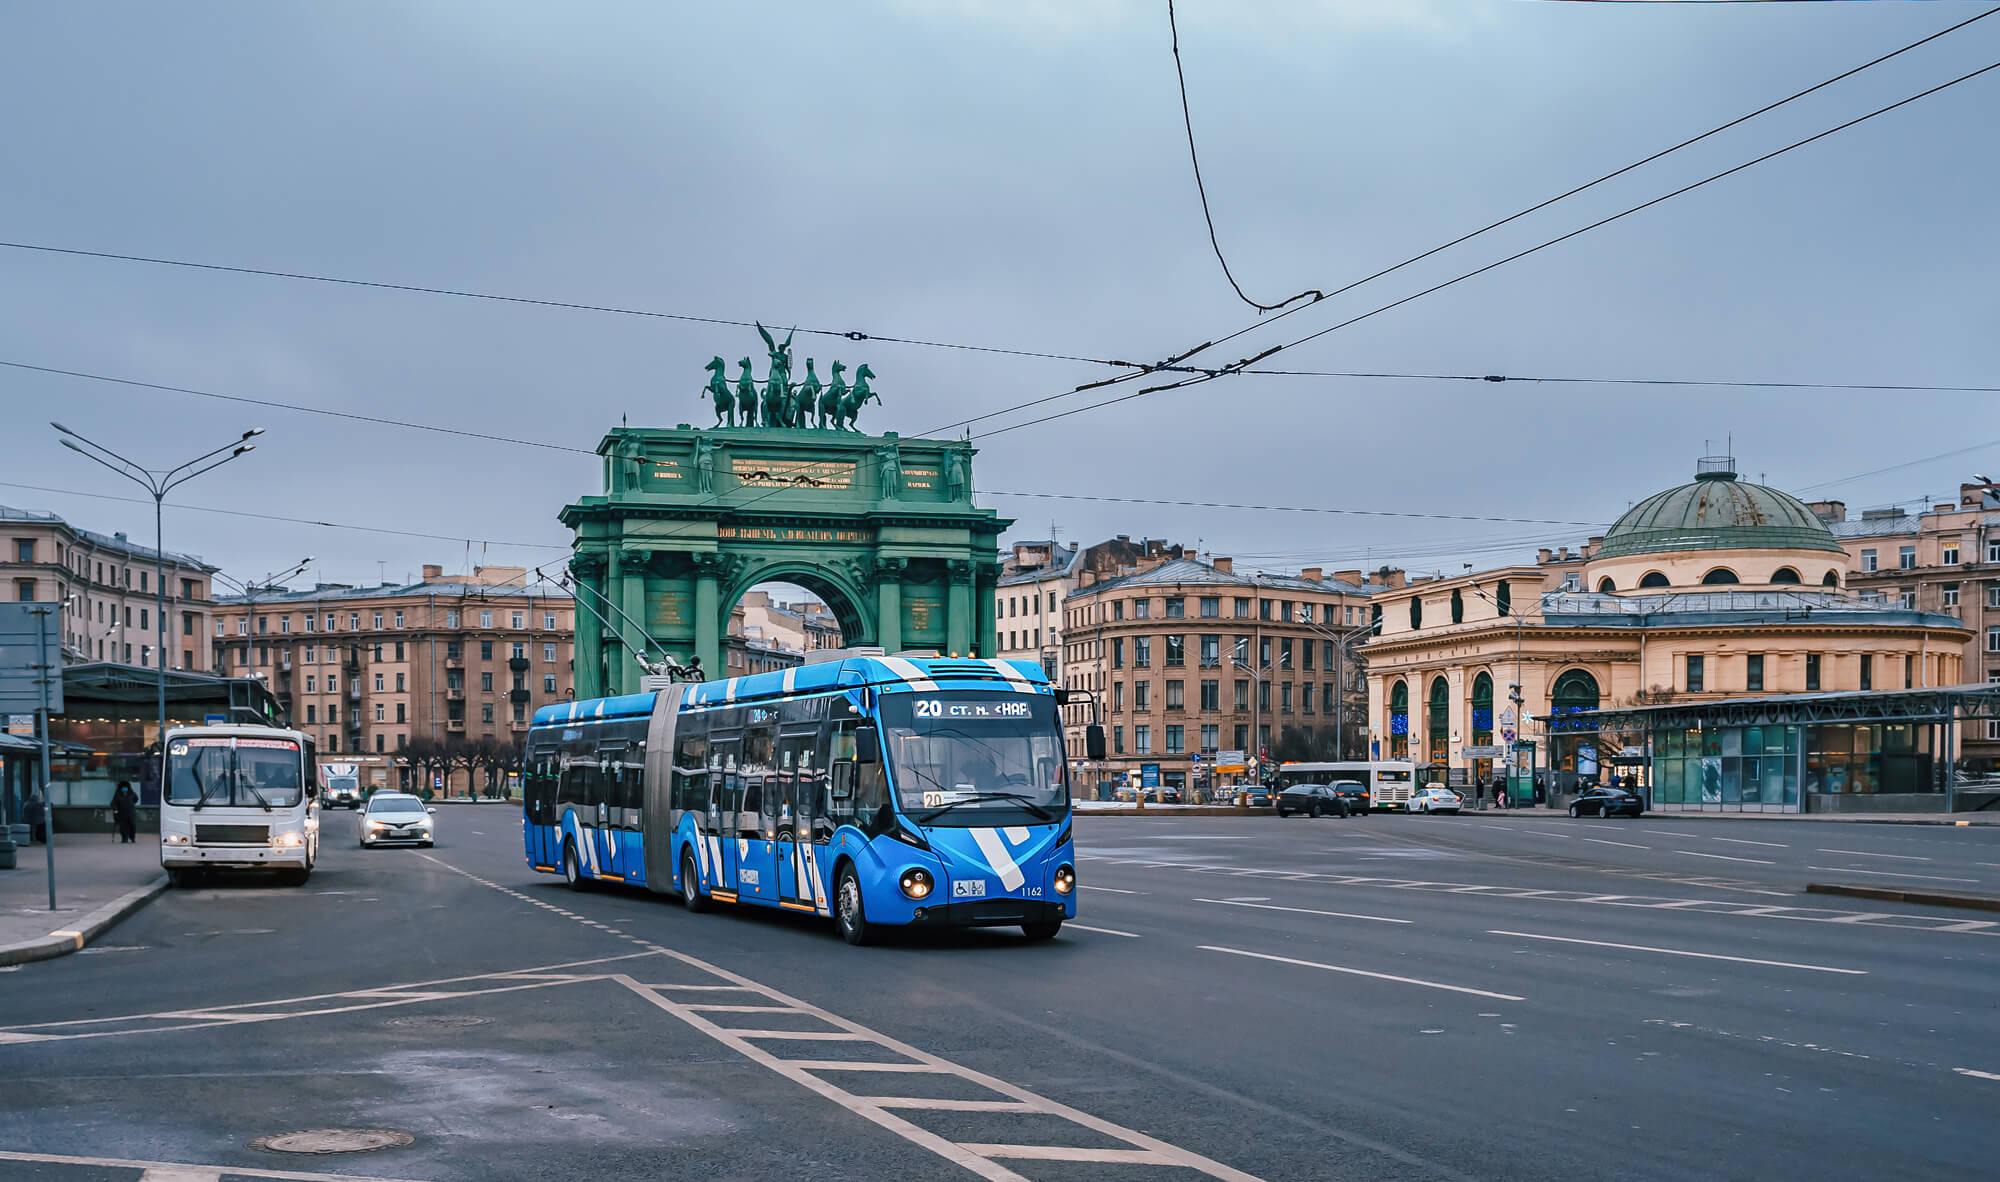 public transport in St. Petersburg